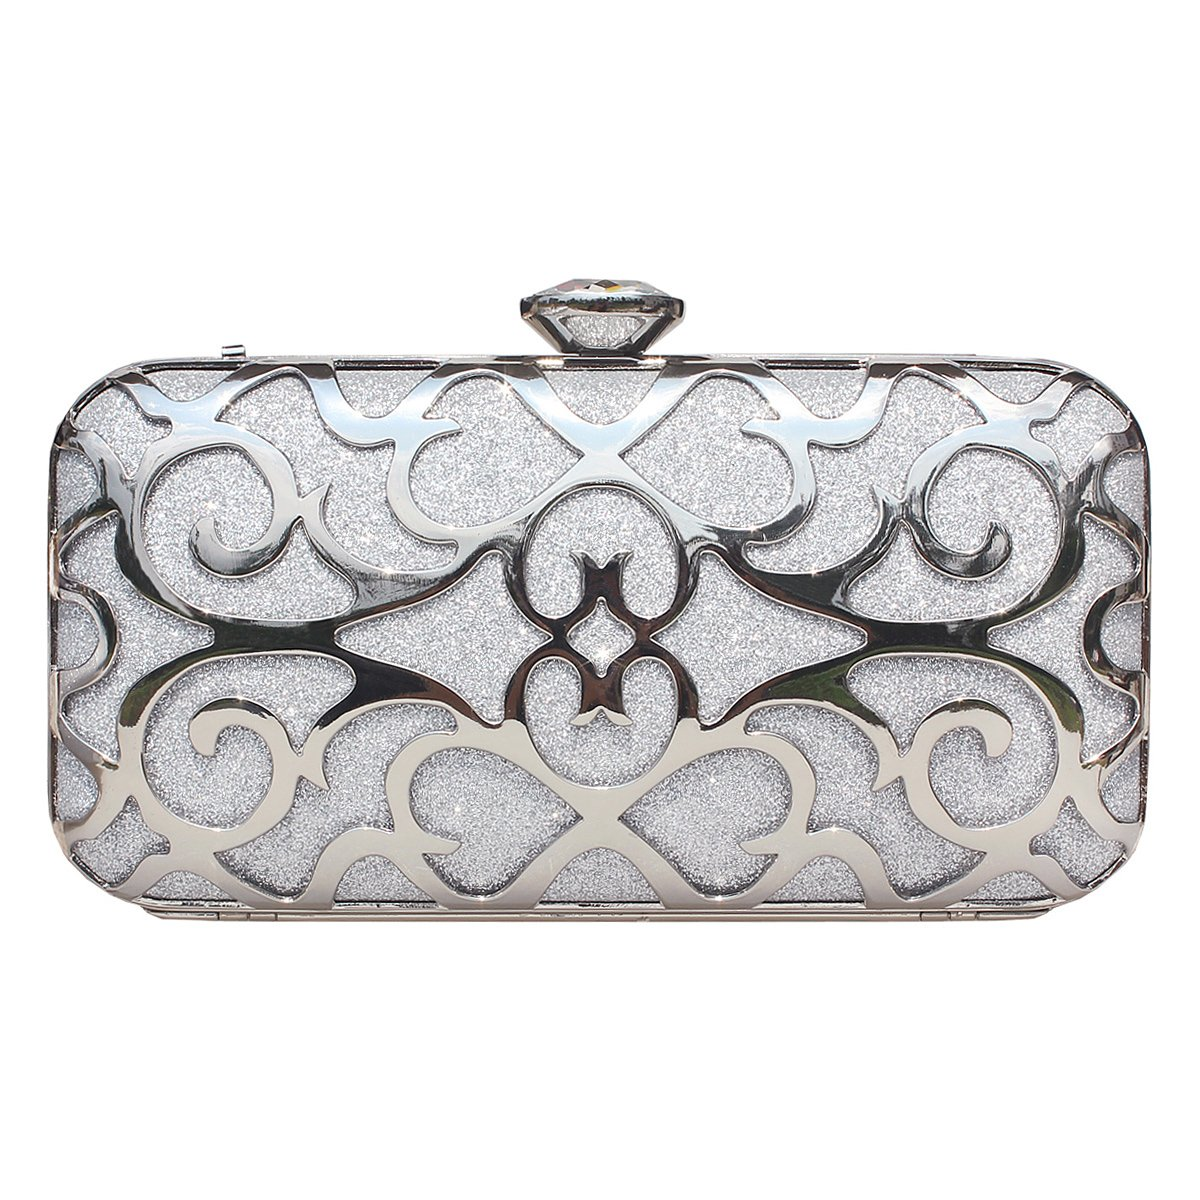 Women Clutches Metallic Evening Bag Handbags Wedding Party Cocktail Purse With Rhinestone Silver.